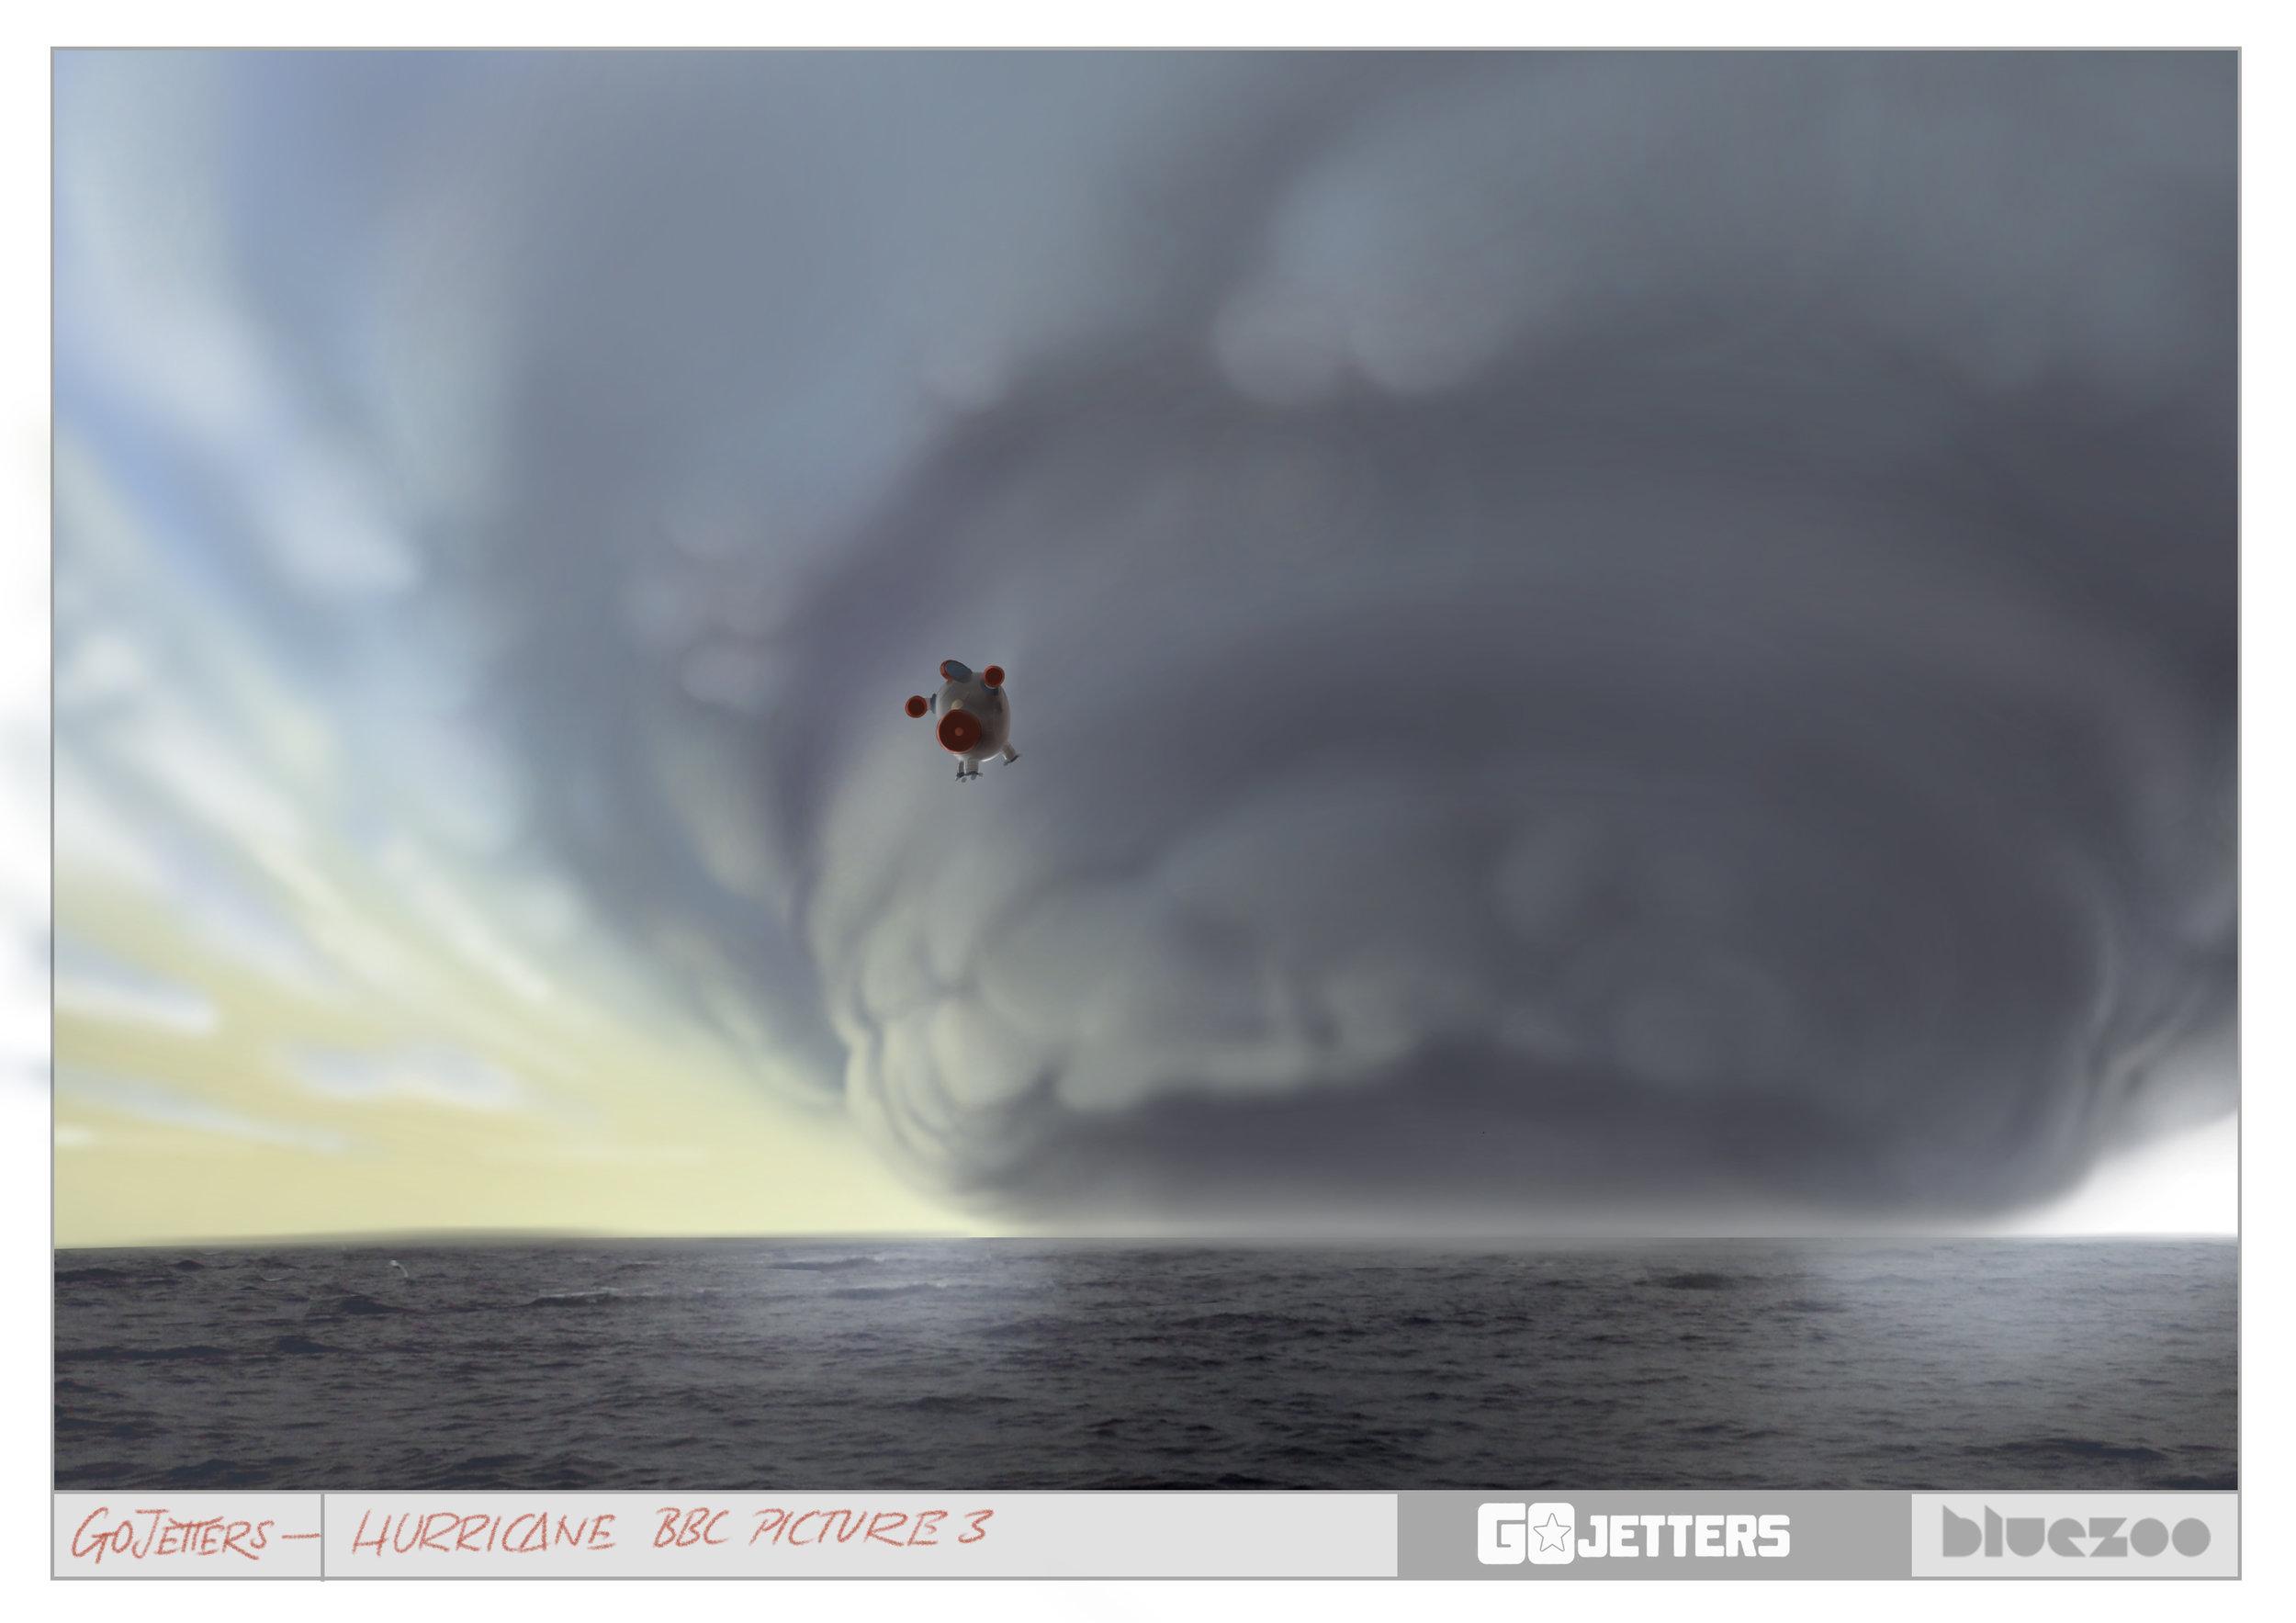 Hurricane_BBCPicture_05.jpg